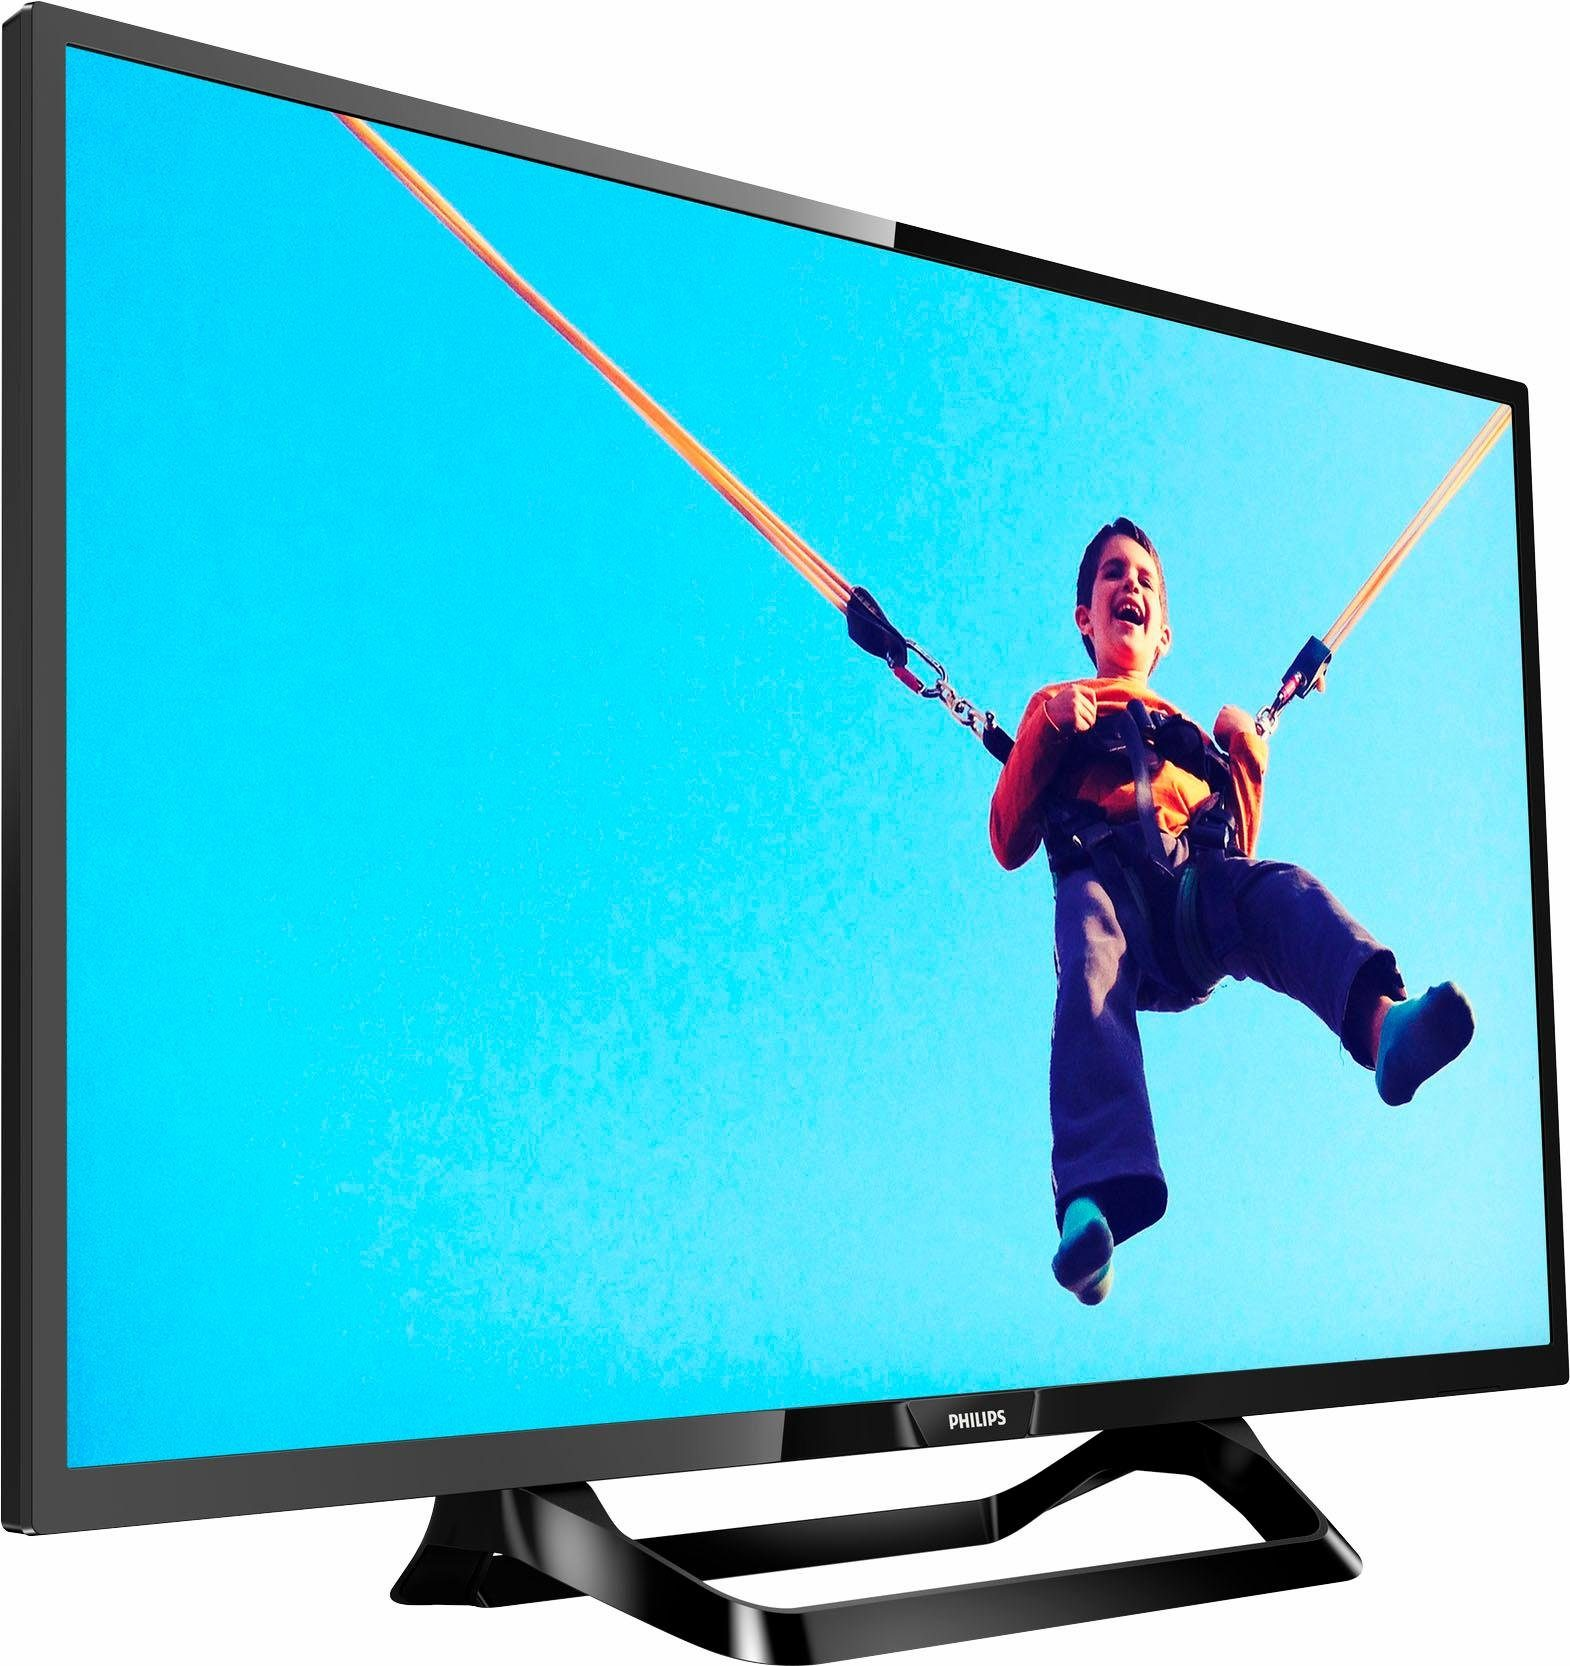 Philips 32PFS5362/12 LED-Fernseher (80 cm/32 Zoll, Full HD, Smart-TV, USB-Recording)